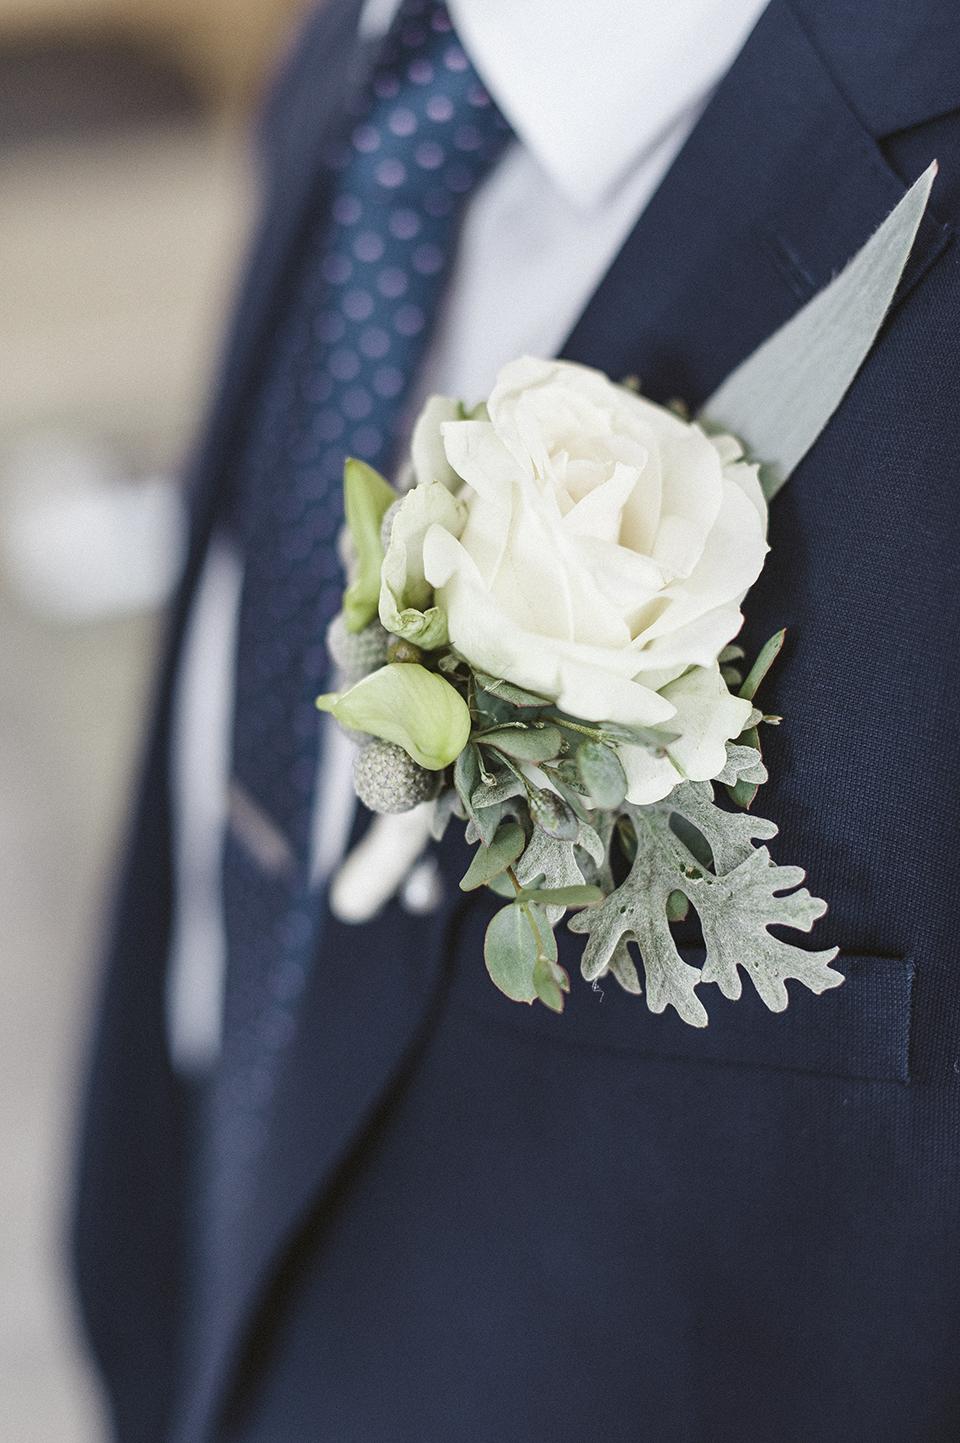 RyanParker_WeddingPhotographer_FineArt_CapeTown_BonaDea_Hermanus_S&A_DSC_1334.jpg